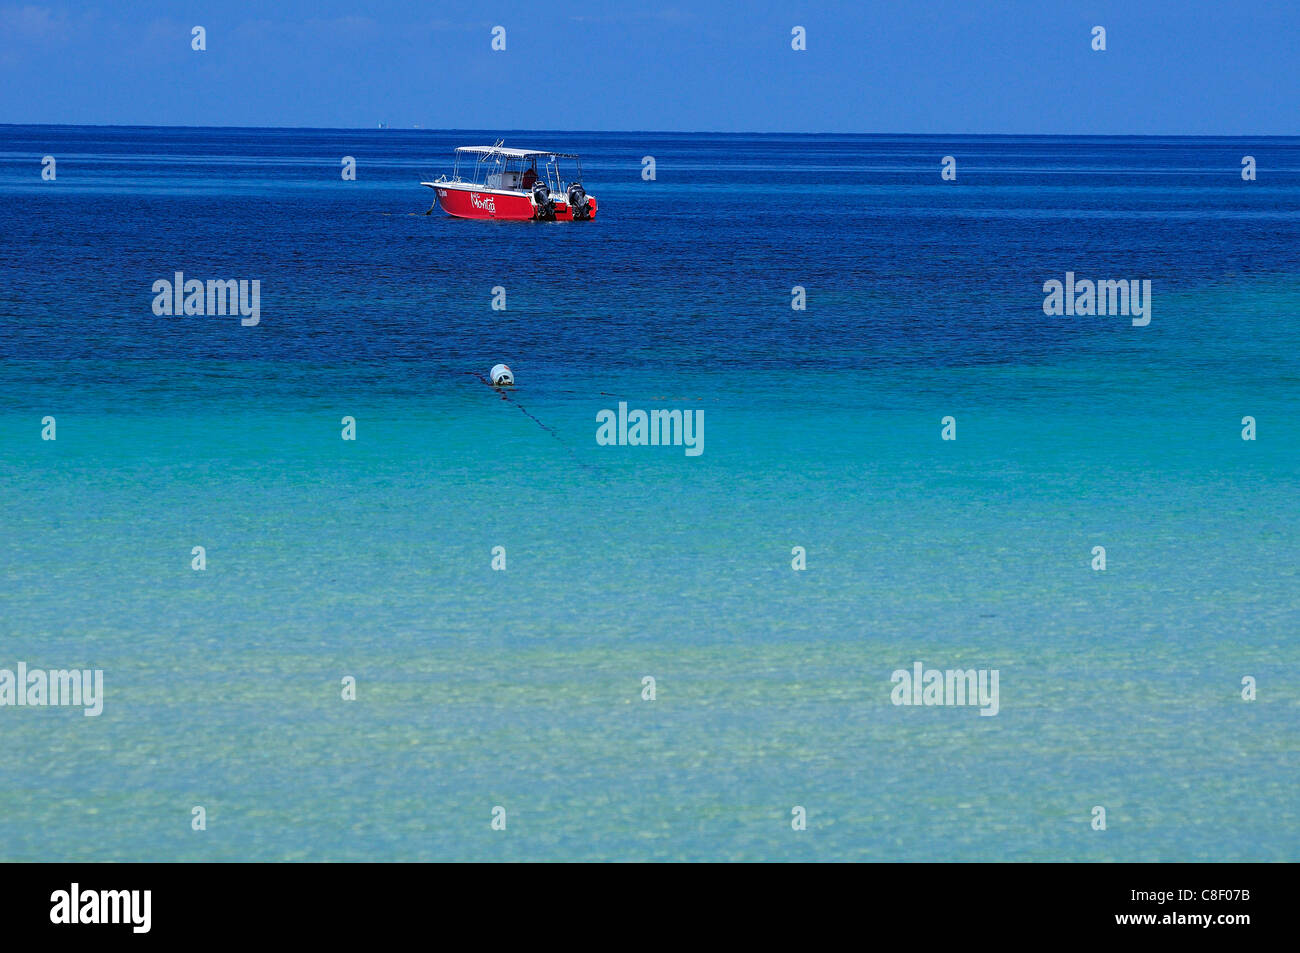 Türkis, Wasser, Sai Ree, Beach, Koh Tao, Thailand, Asien, Boot Stockbild